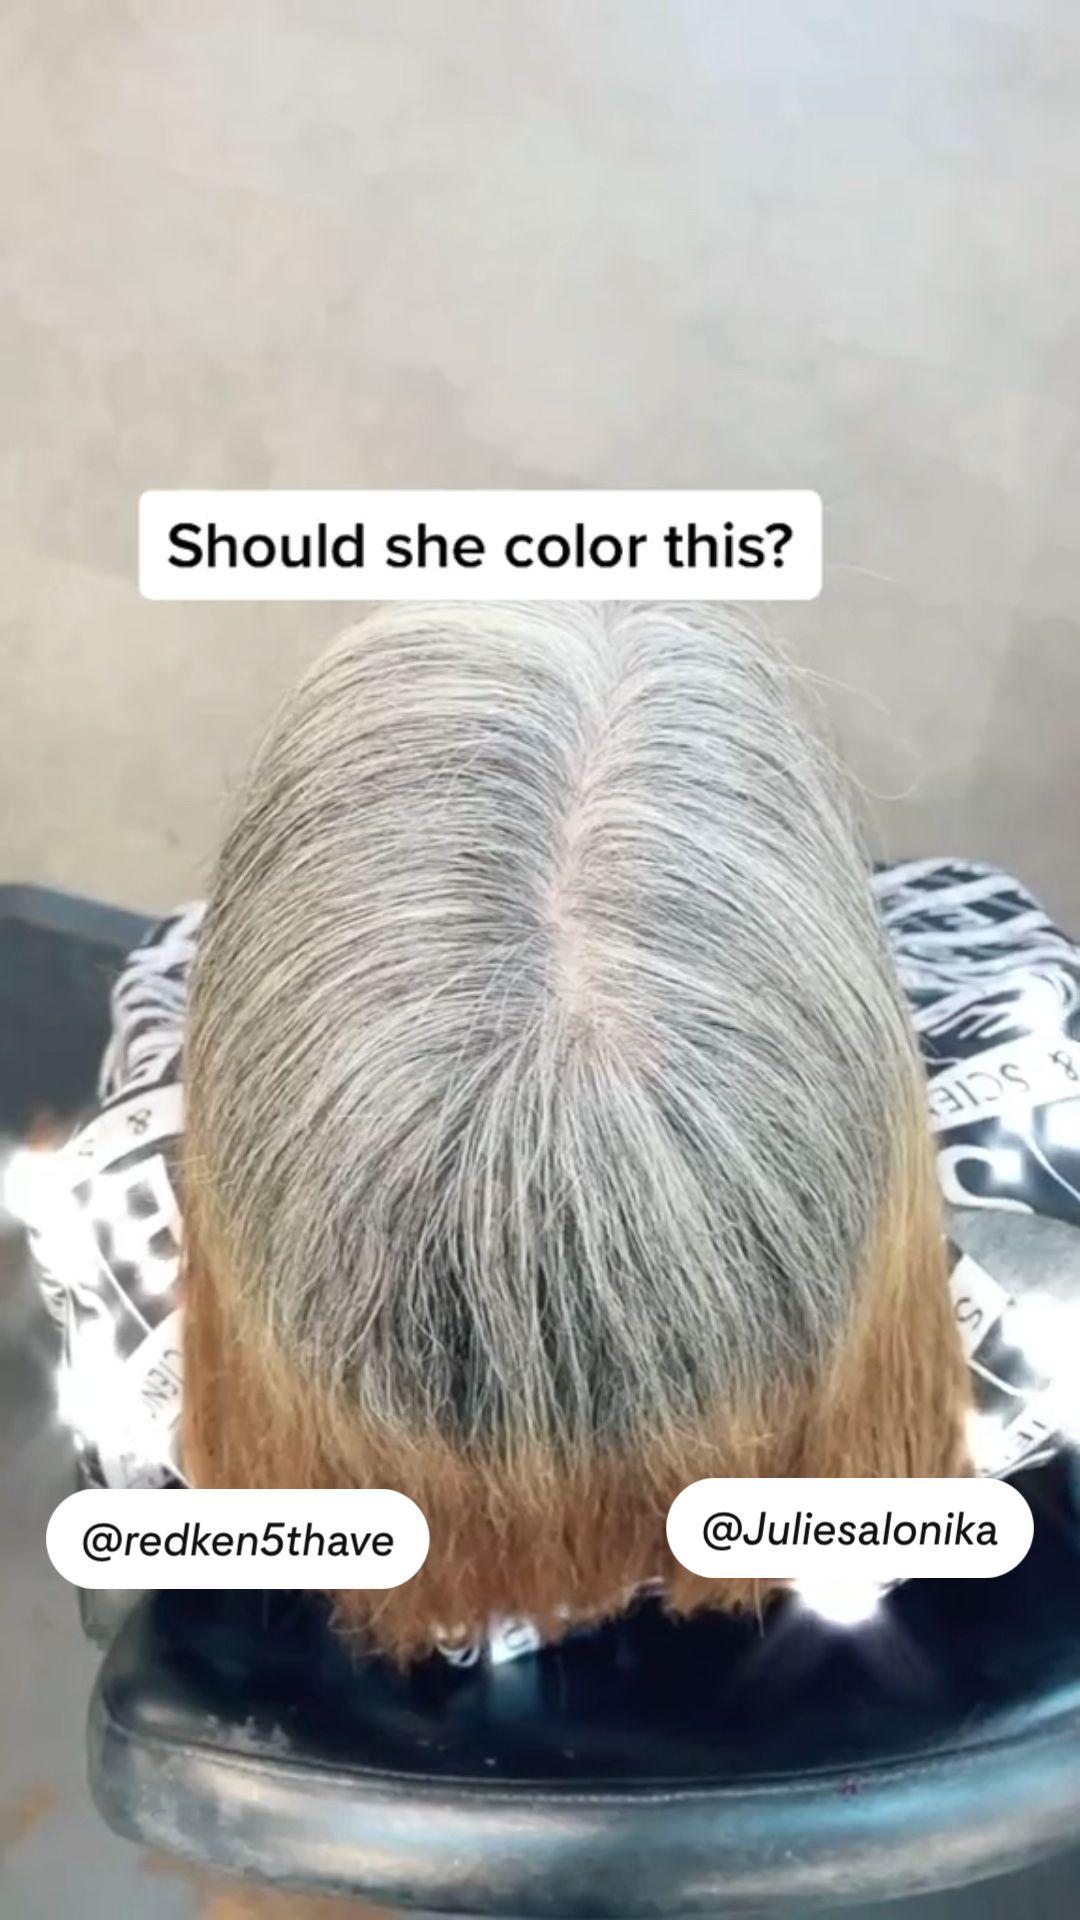 Should she color?